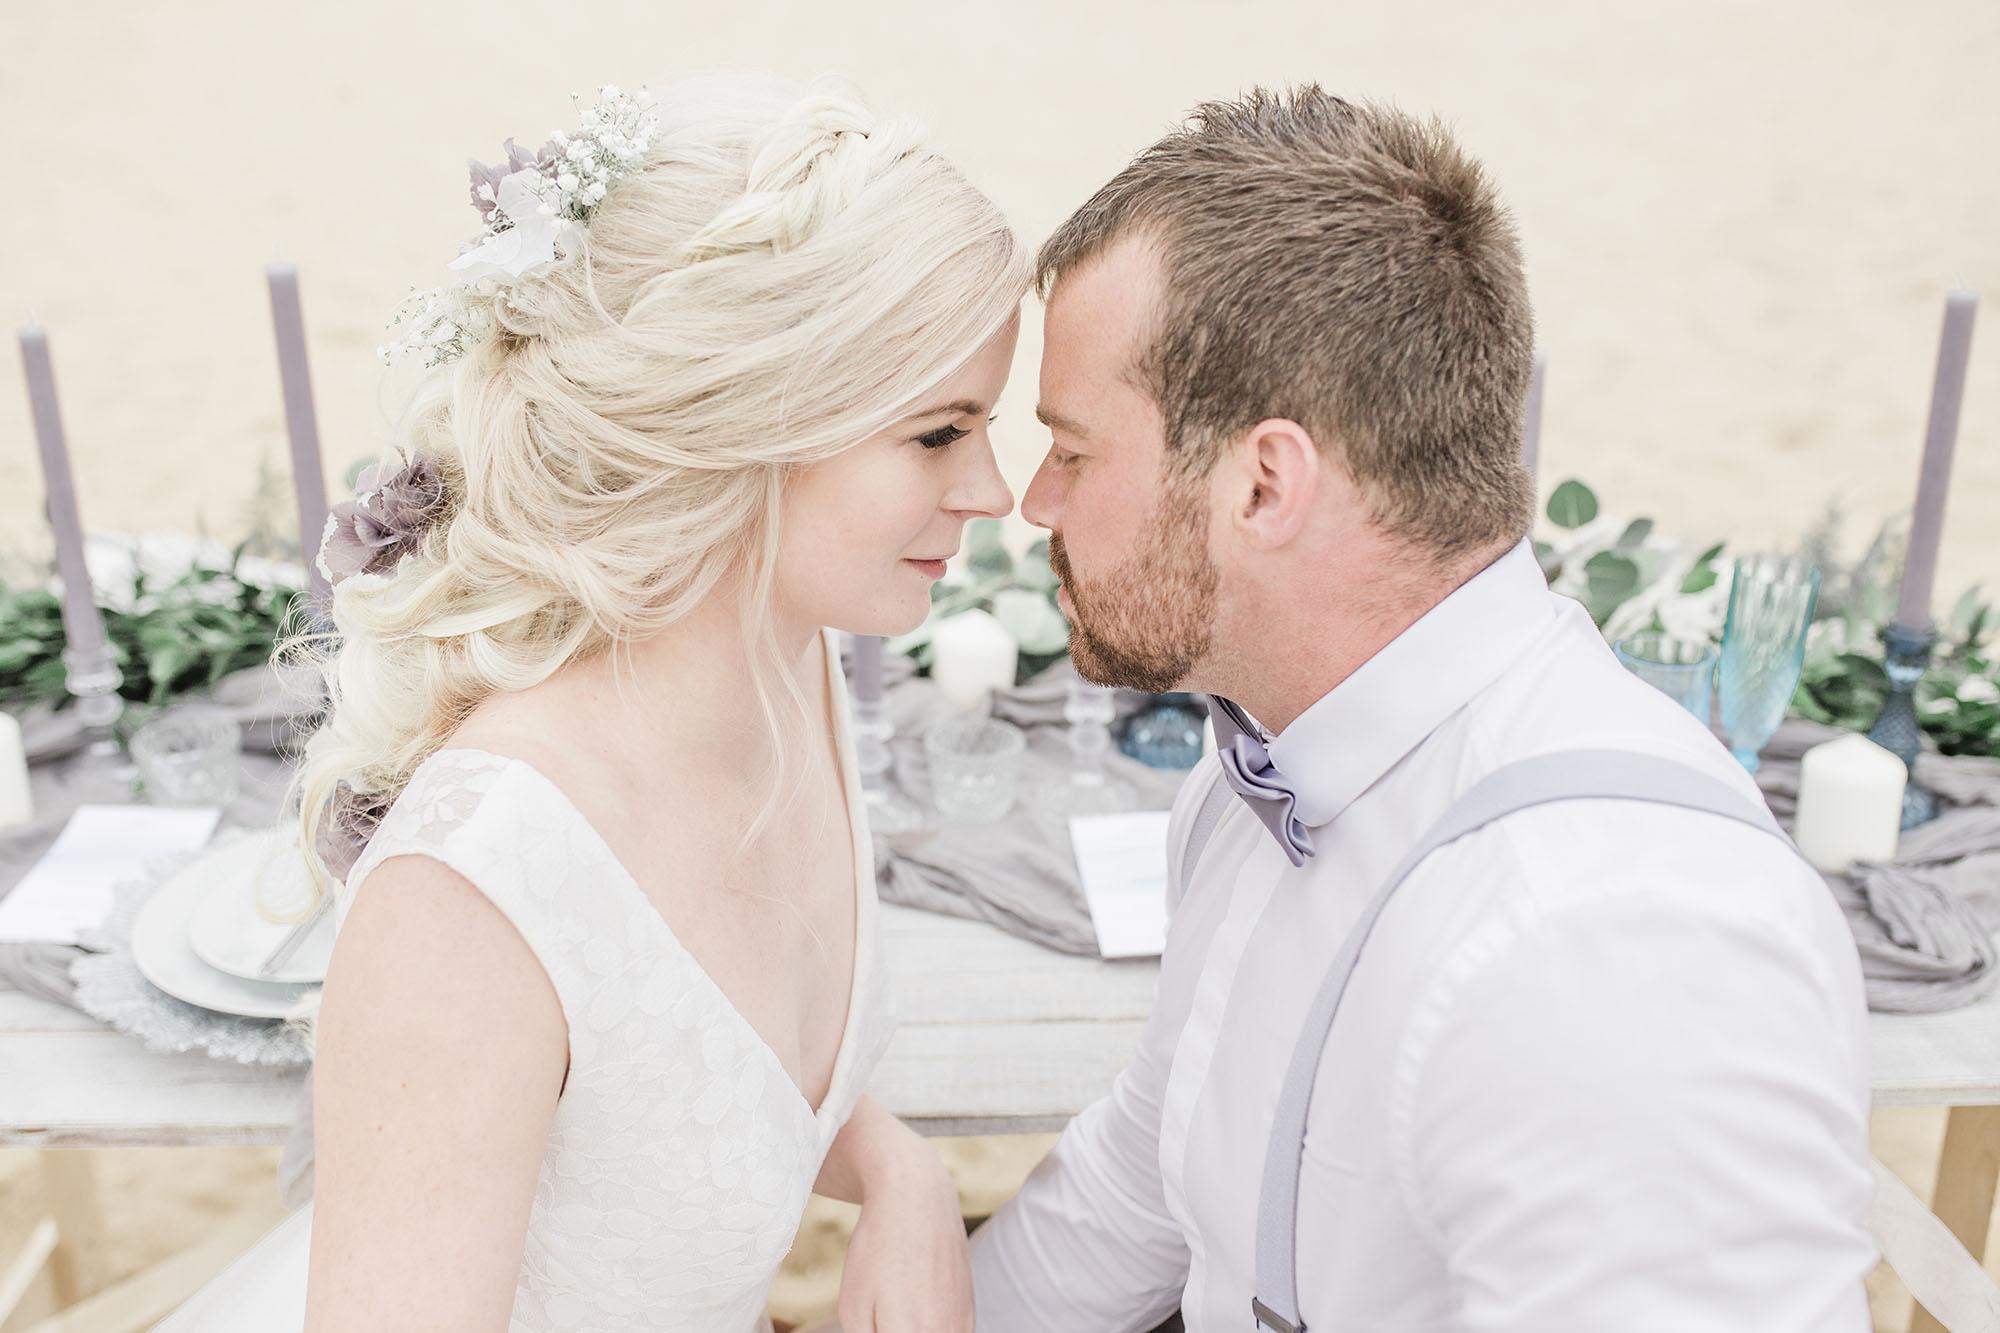 Bride and groom on an ethereal beach wedding shoot